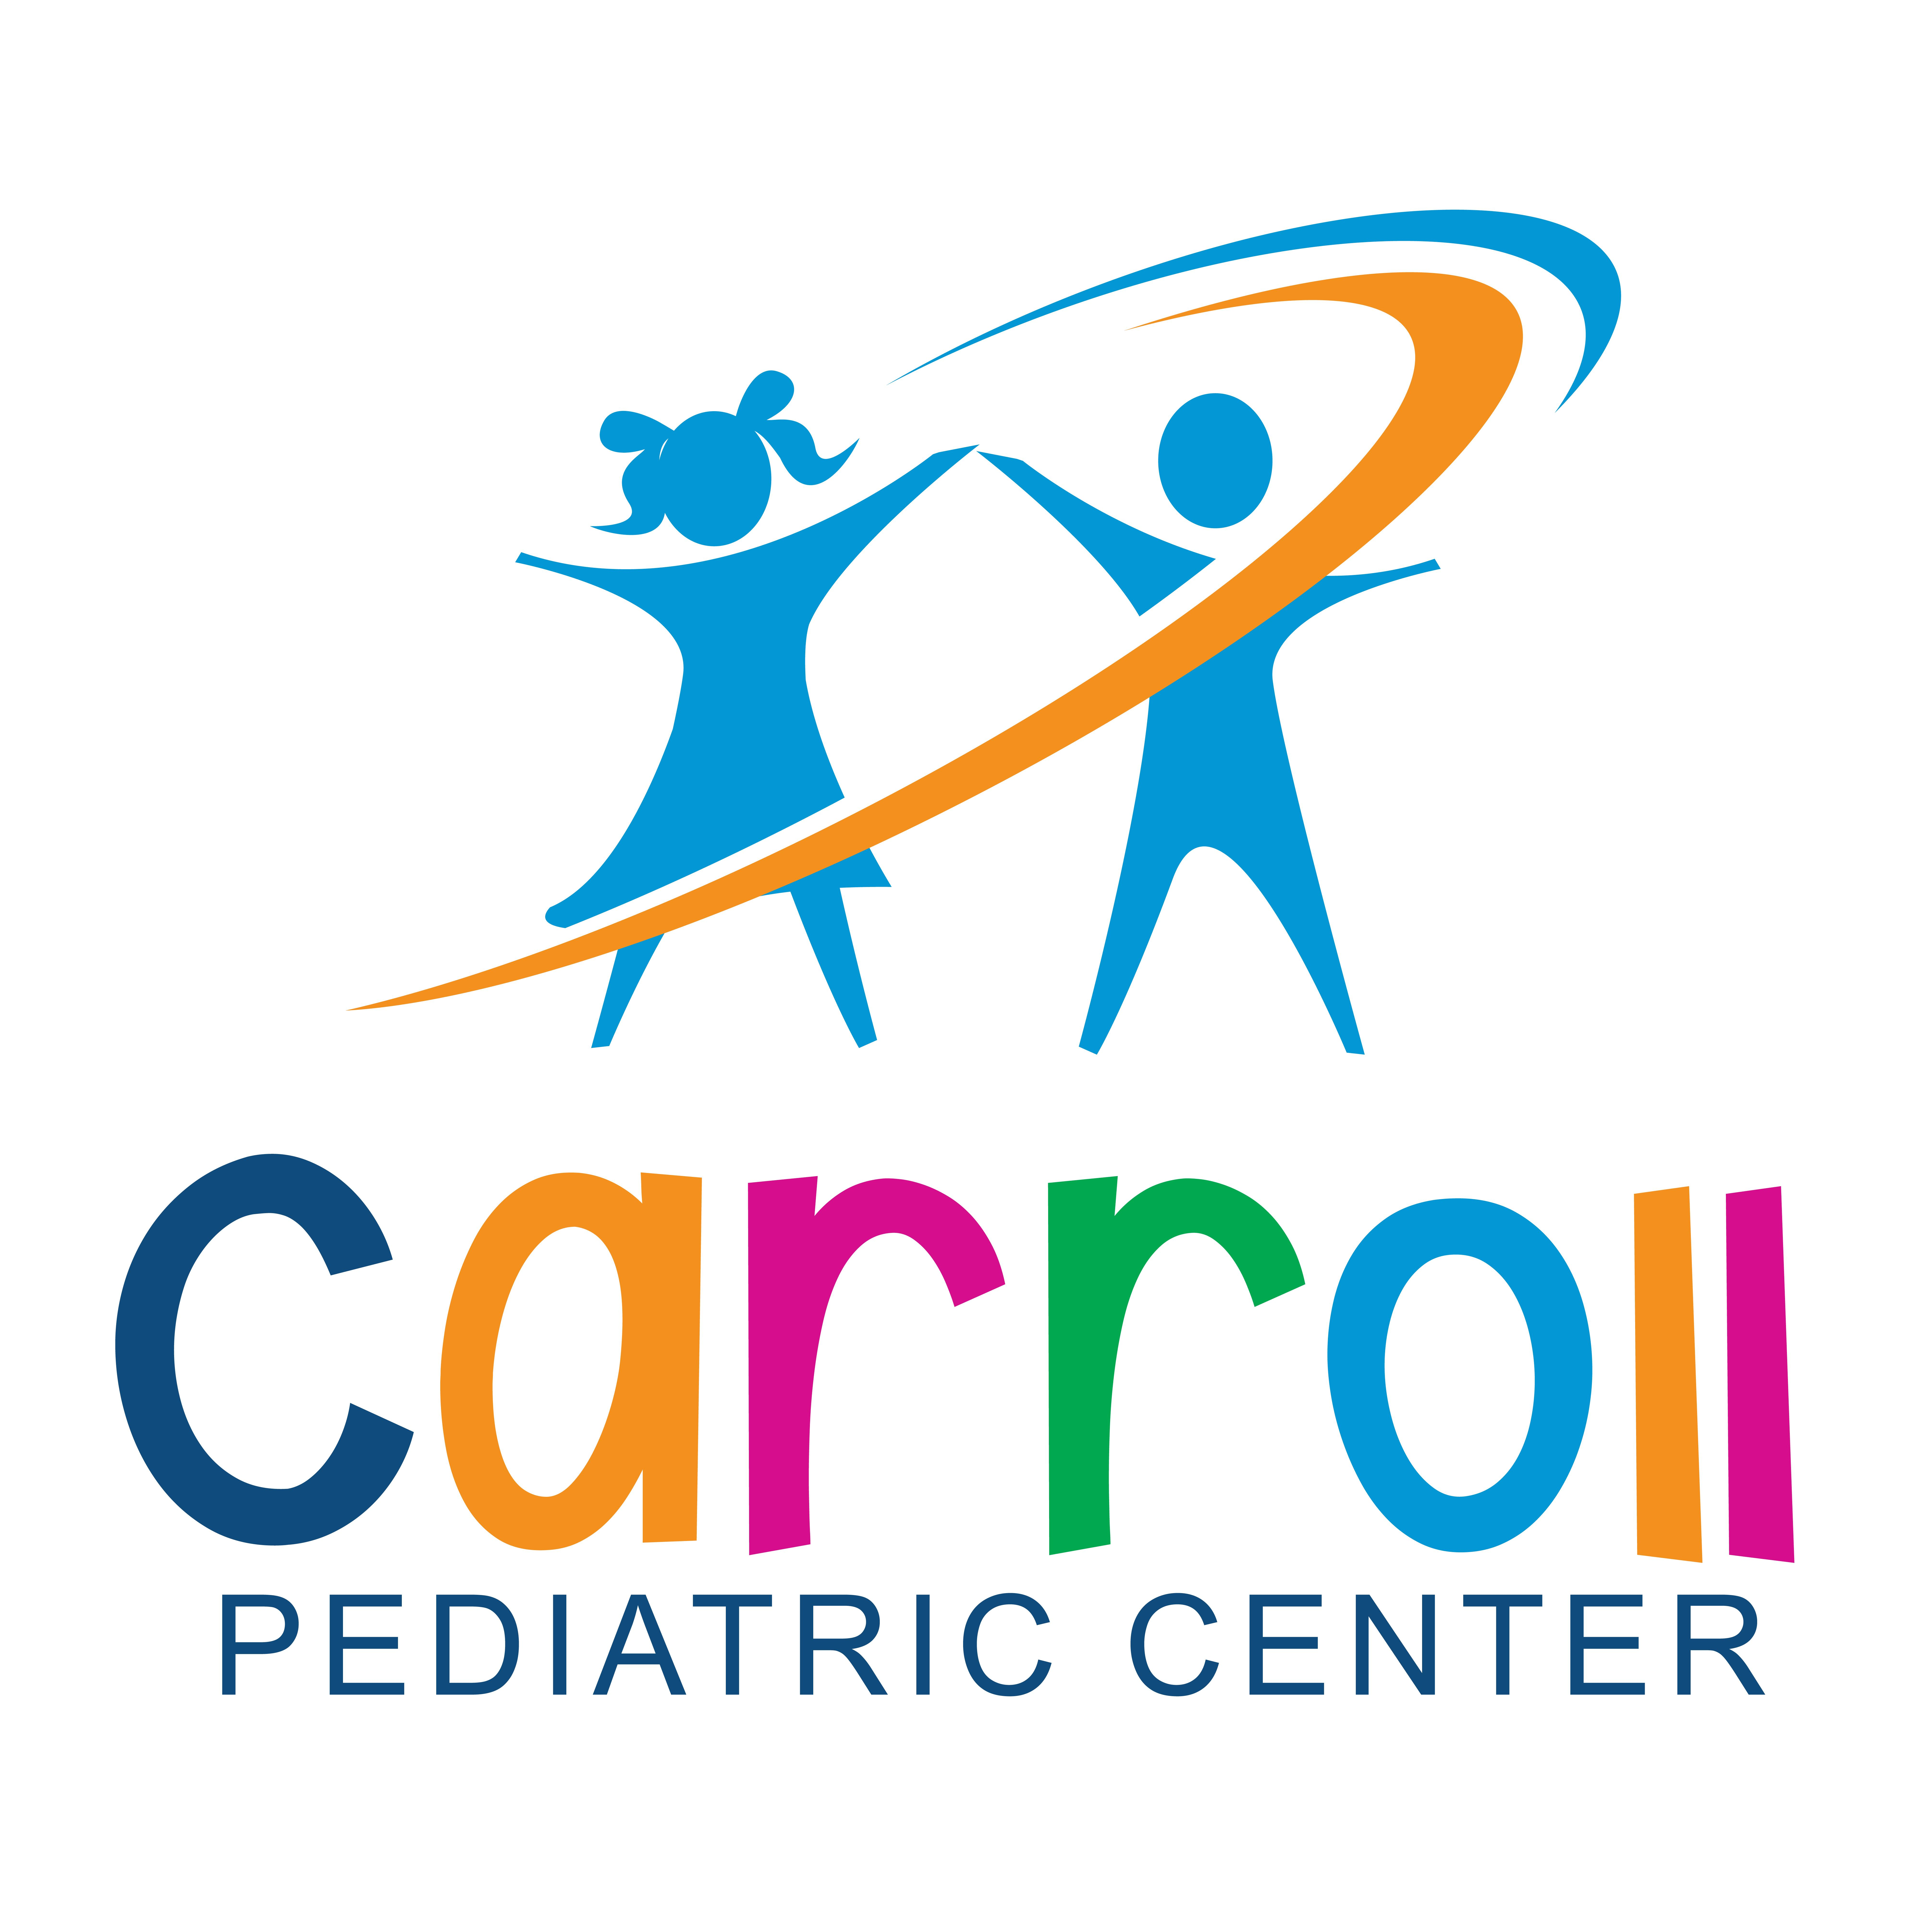 Carroll Pediatric Center